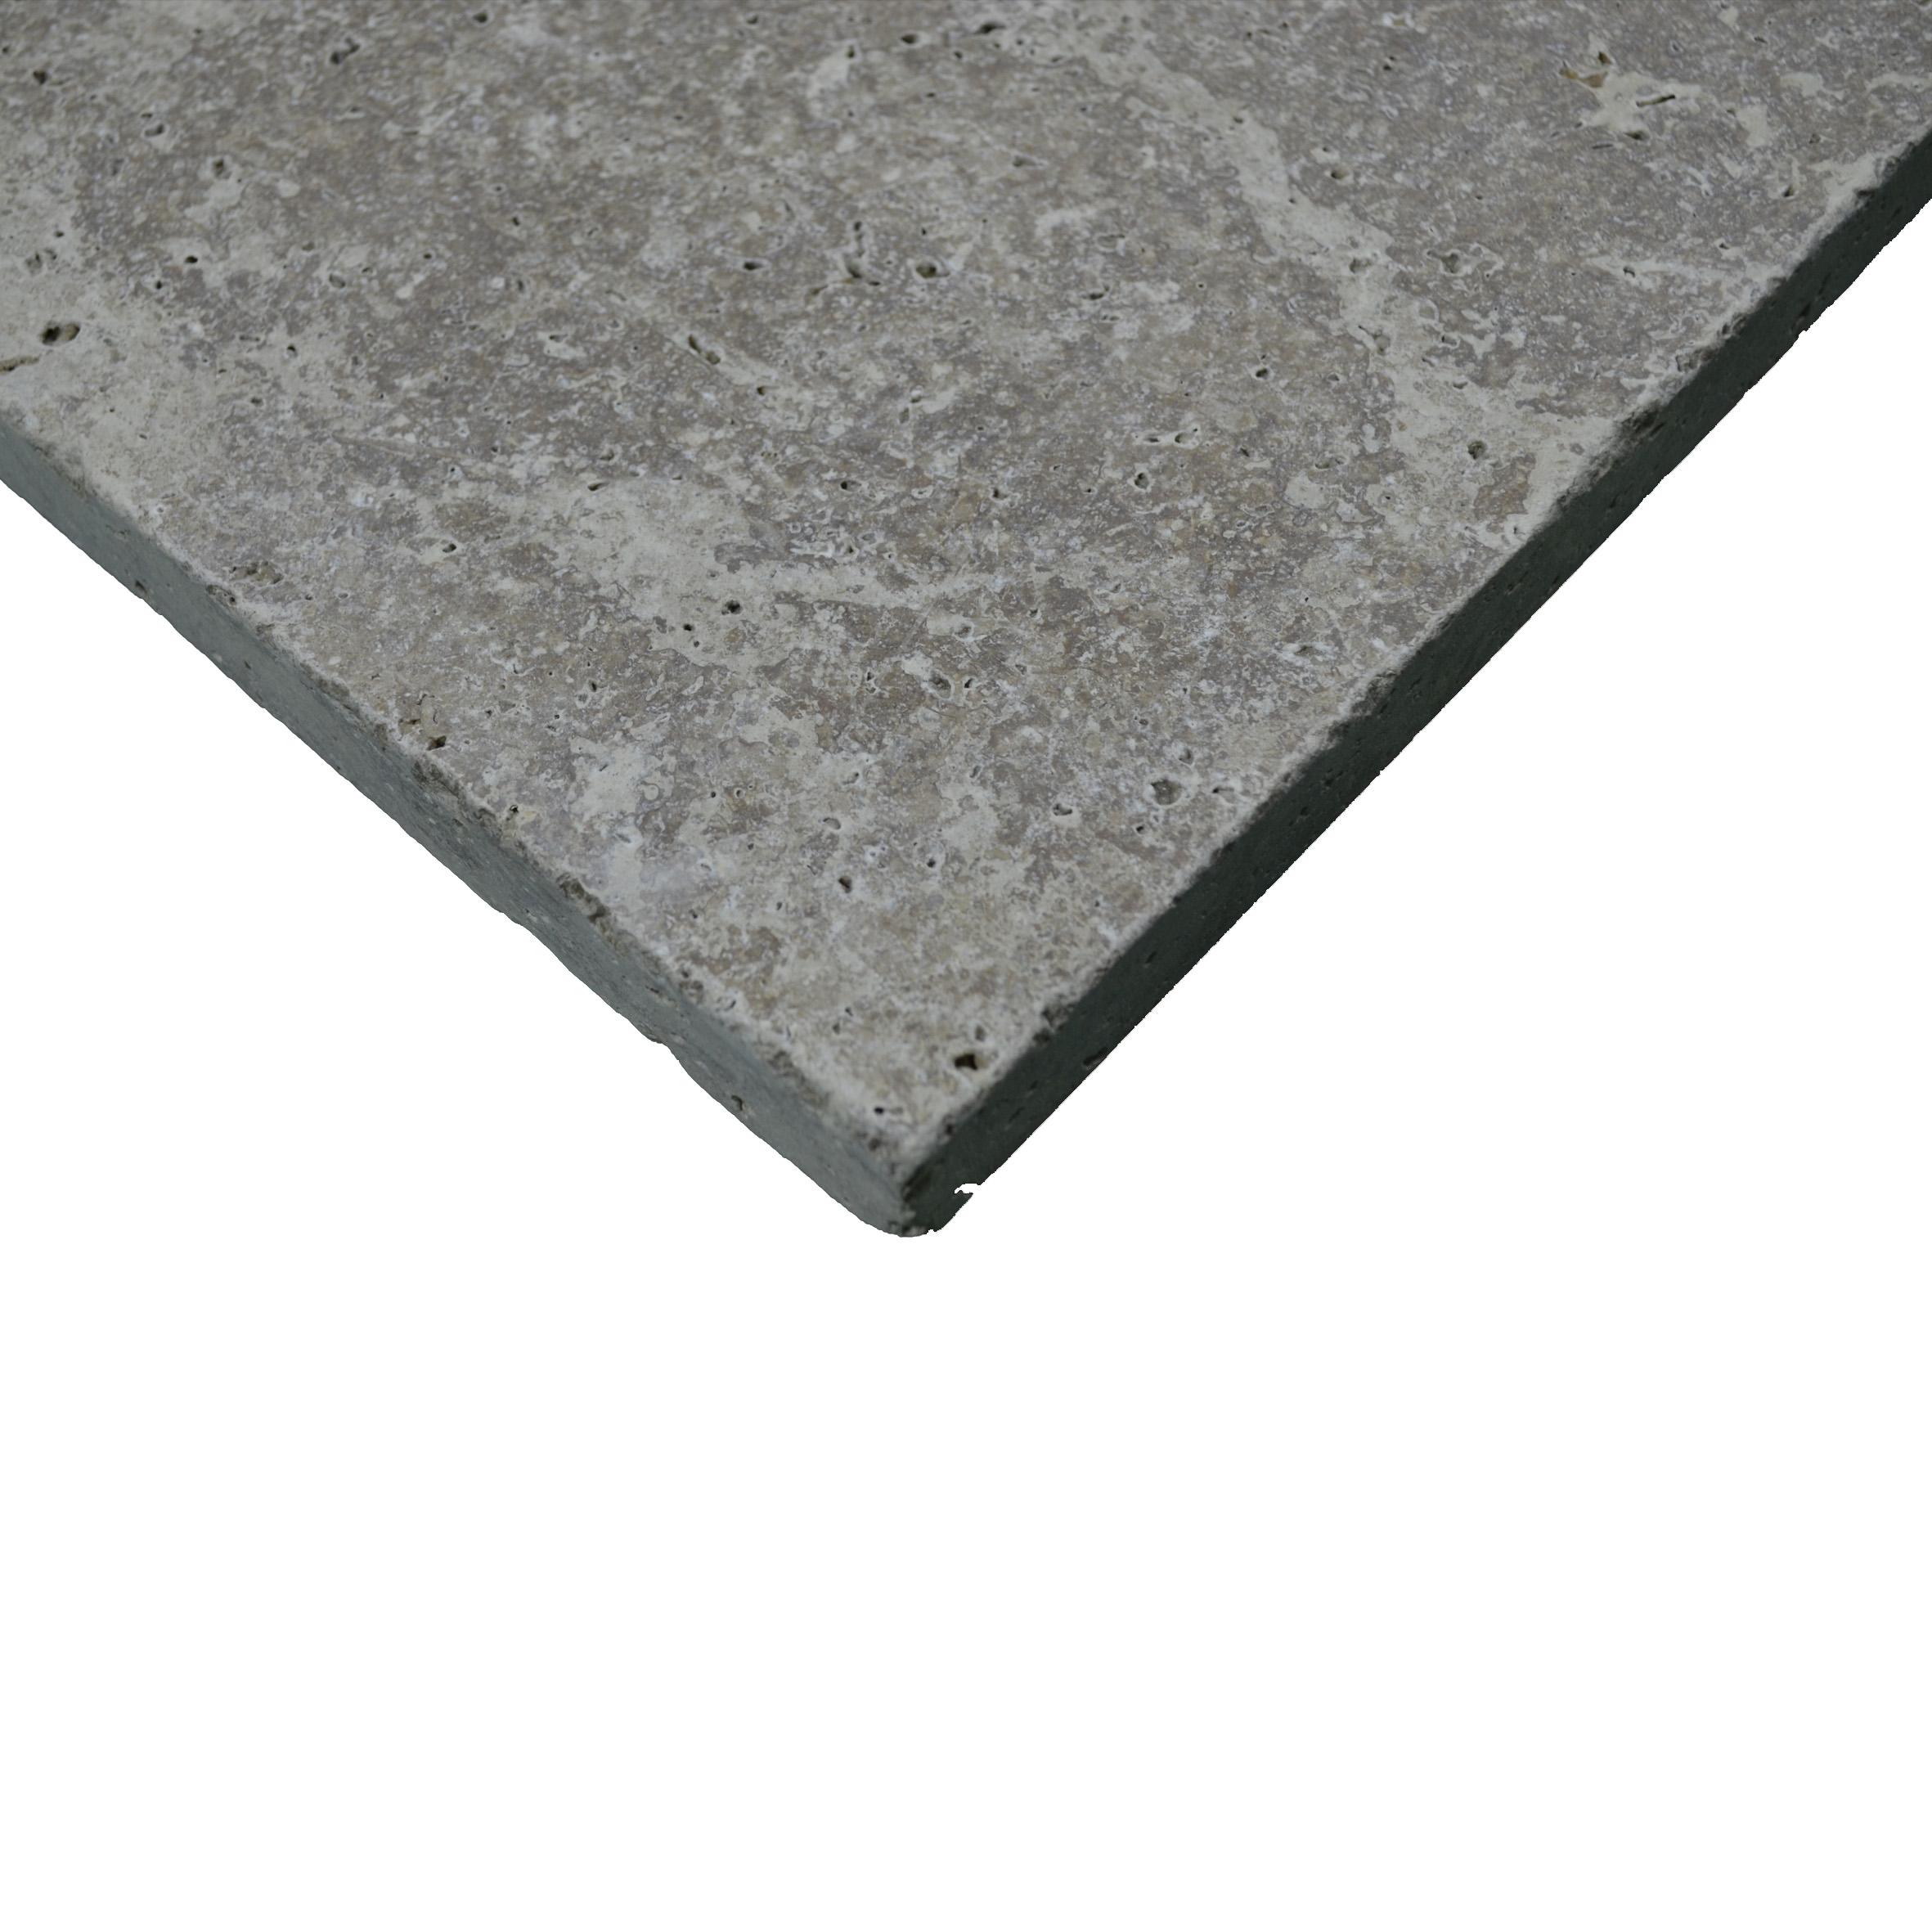 Noce Tumbled Travertine Pavers 12x12-pavers sale-Atlantic Stone Source